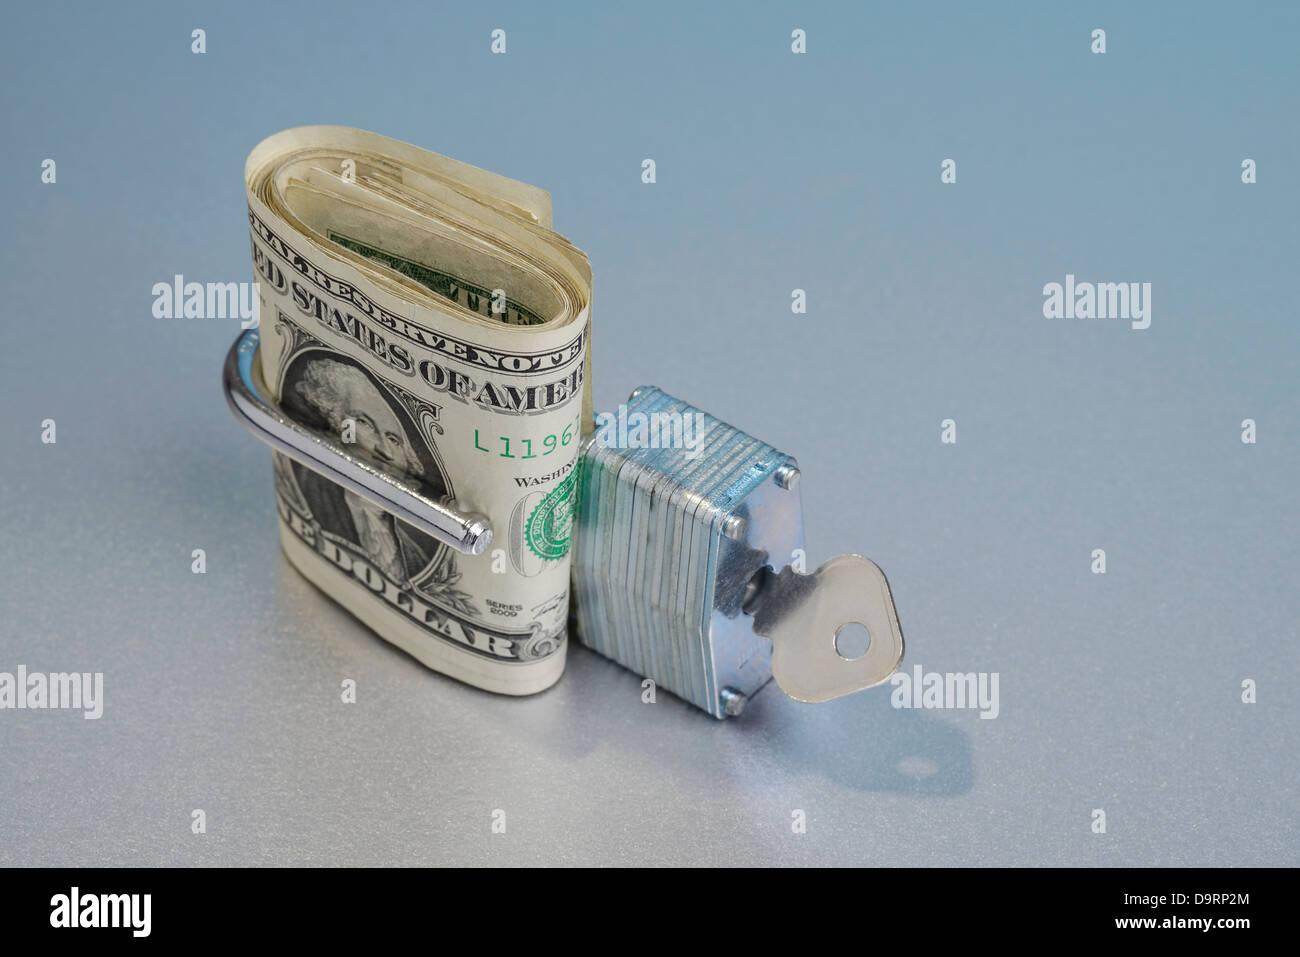 Dollar bills in an open padlock - Stock Image